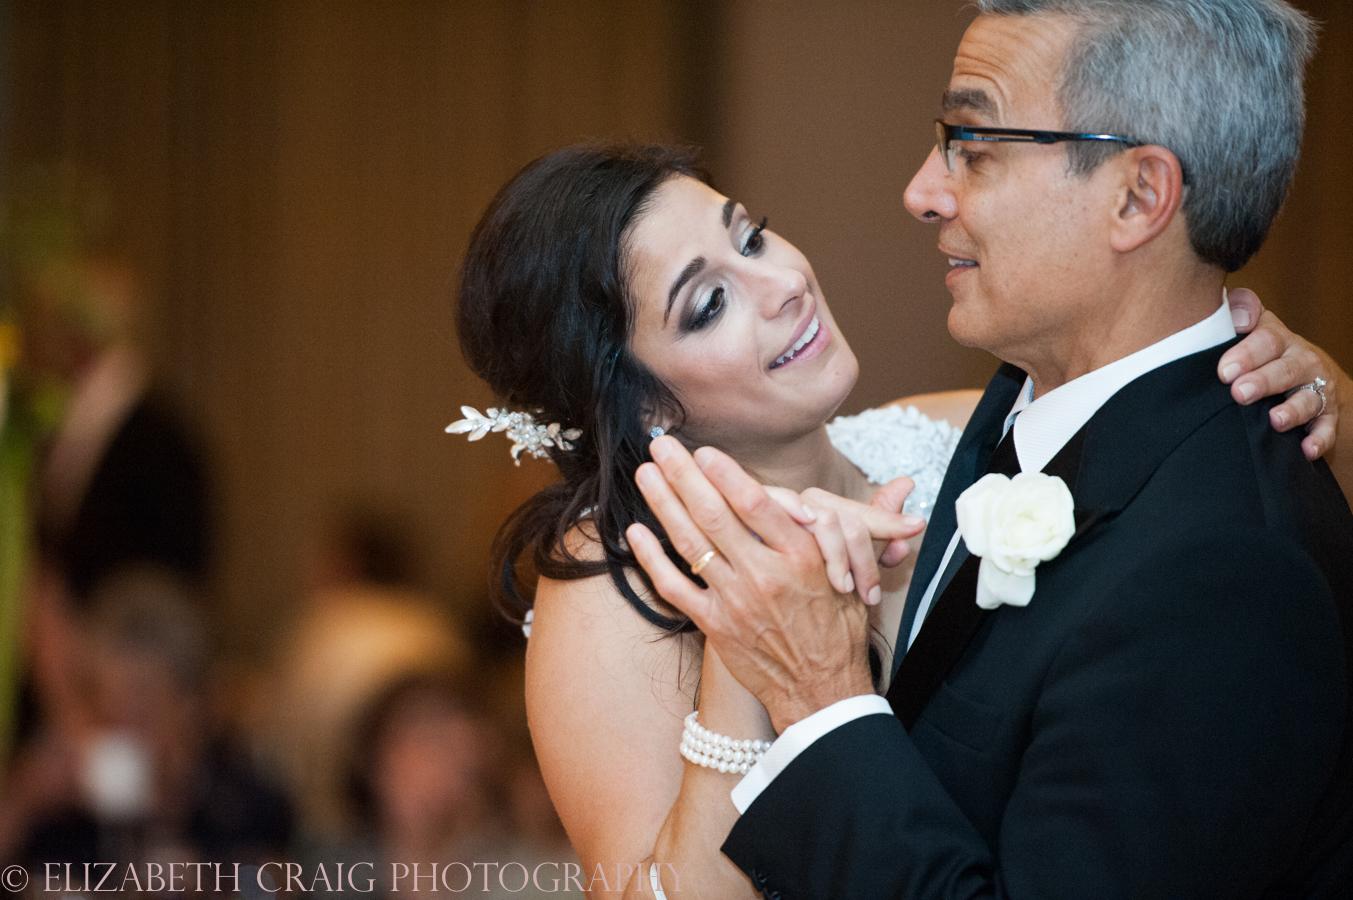 pittsburgh-greek-weddings-fairmont-weddings-receptions-elizabeth-craig-photohgraphy-029